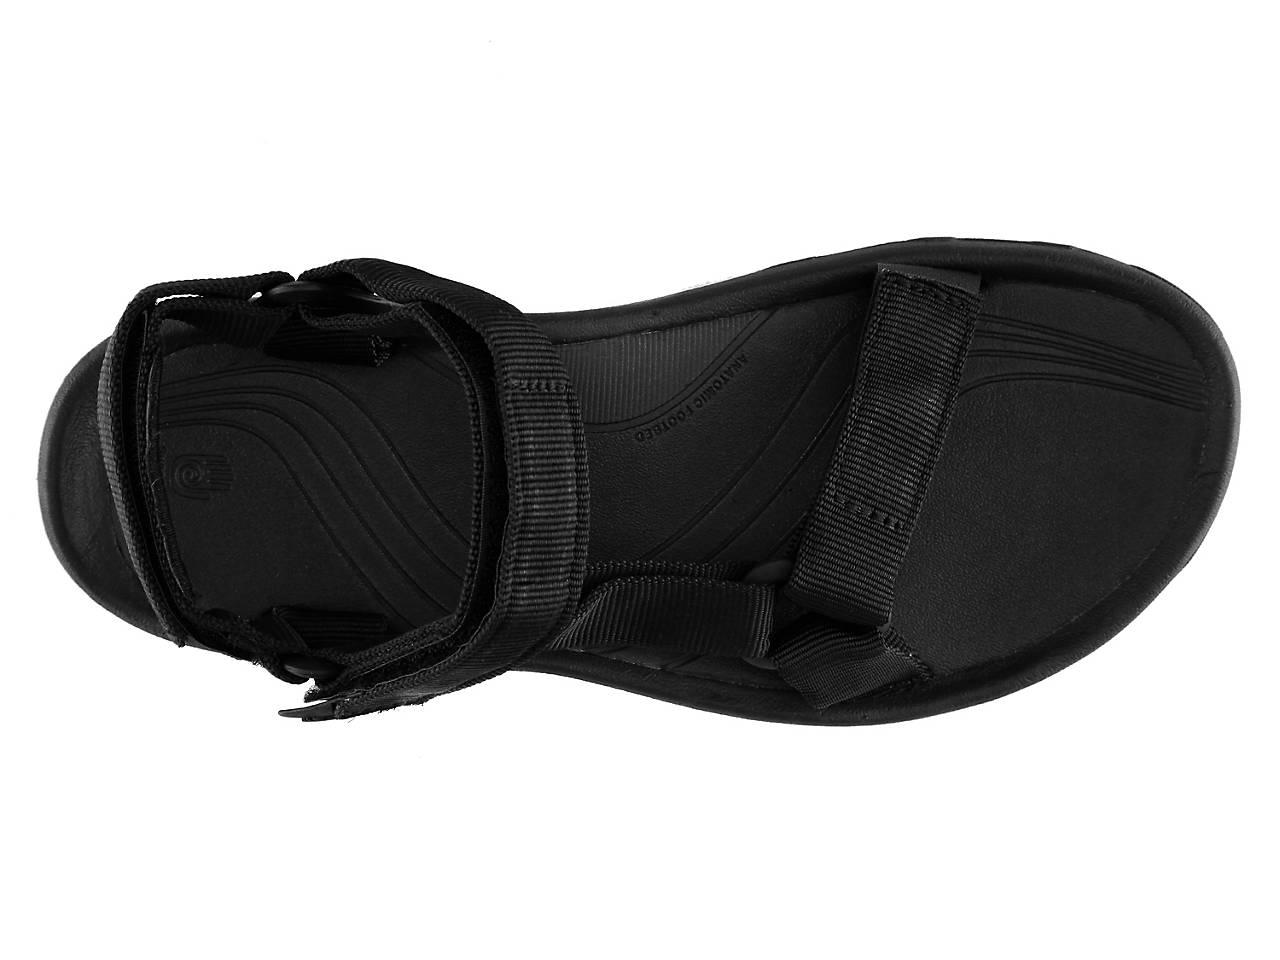 d2d5fd8685dd Teva Hurricane XLT Sandal Men s Shoes